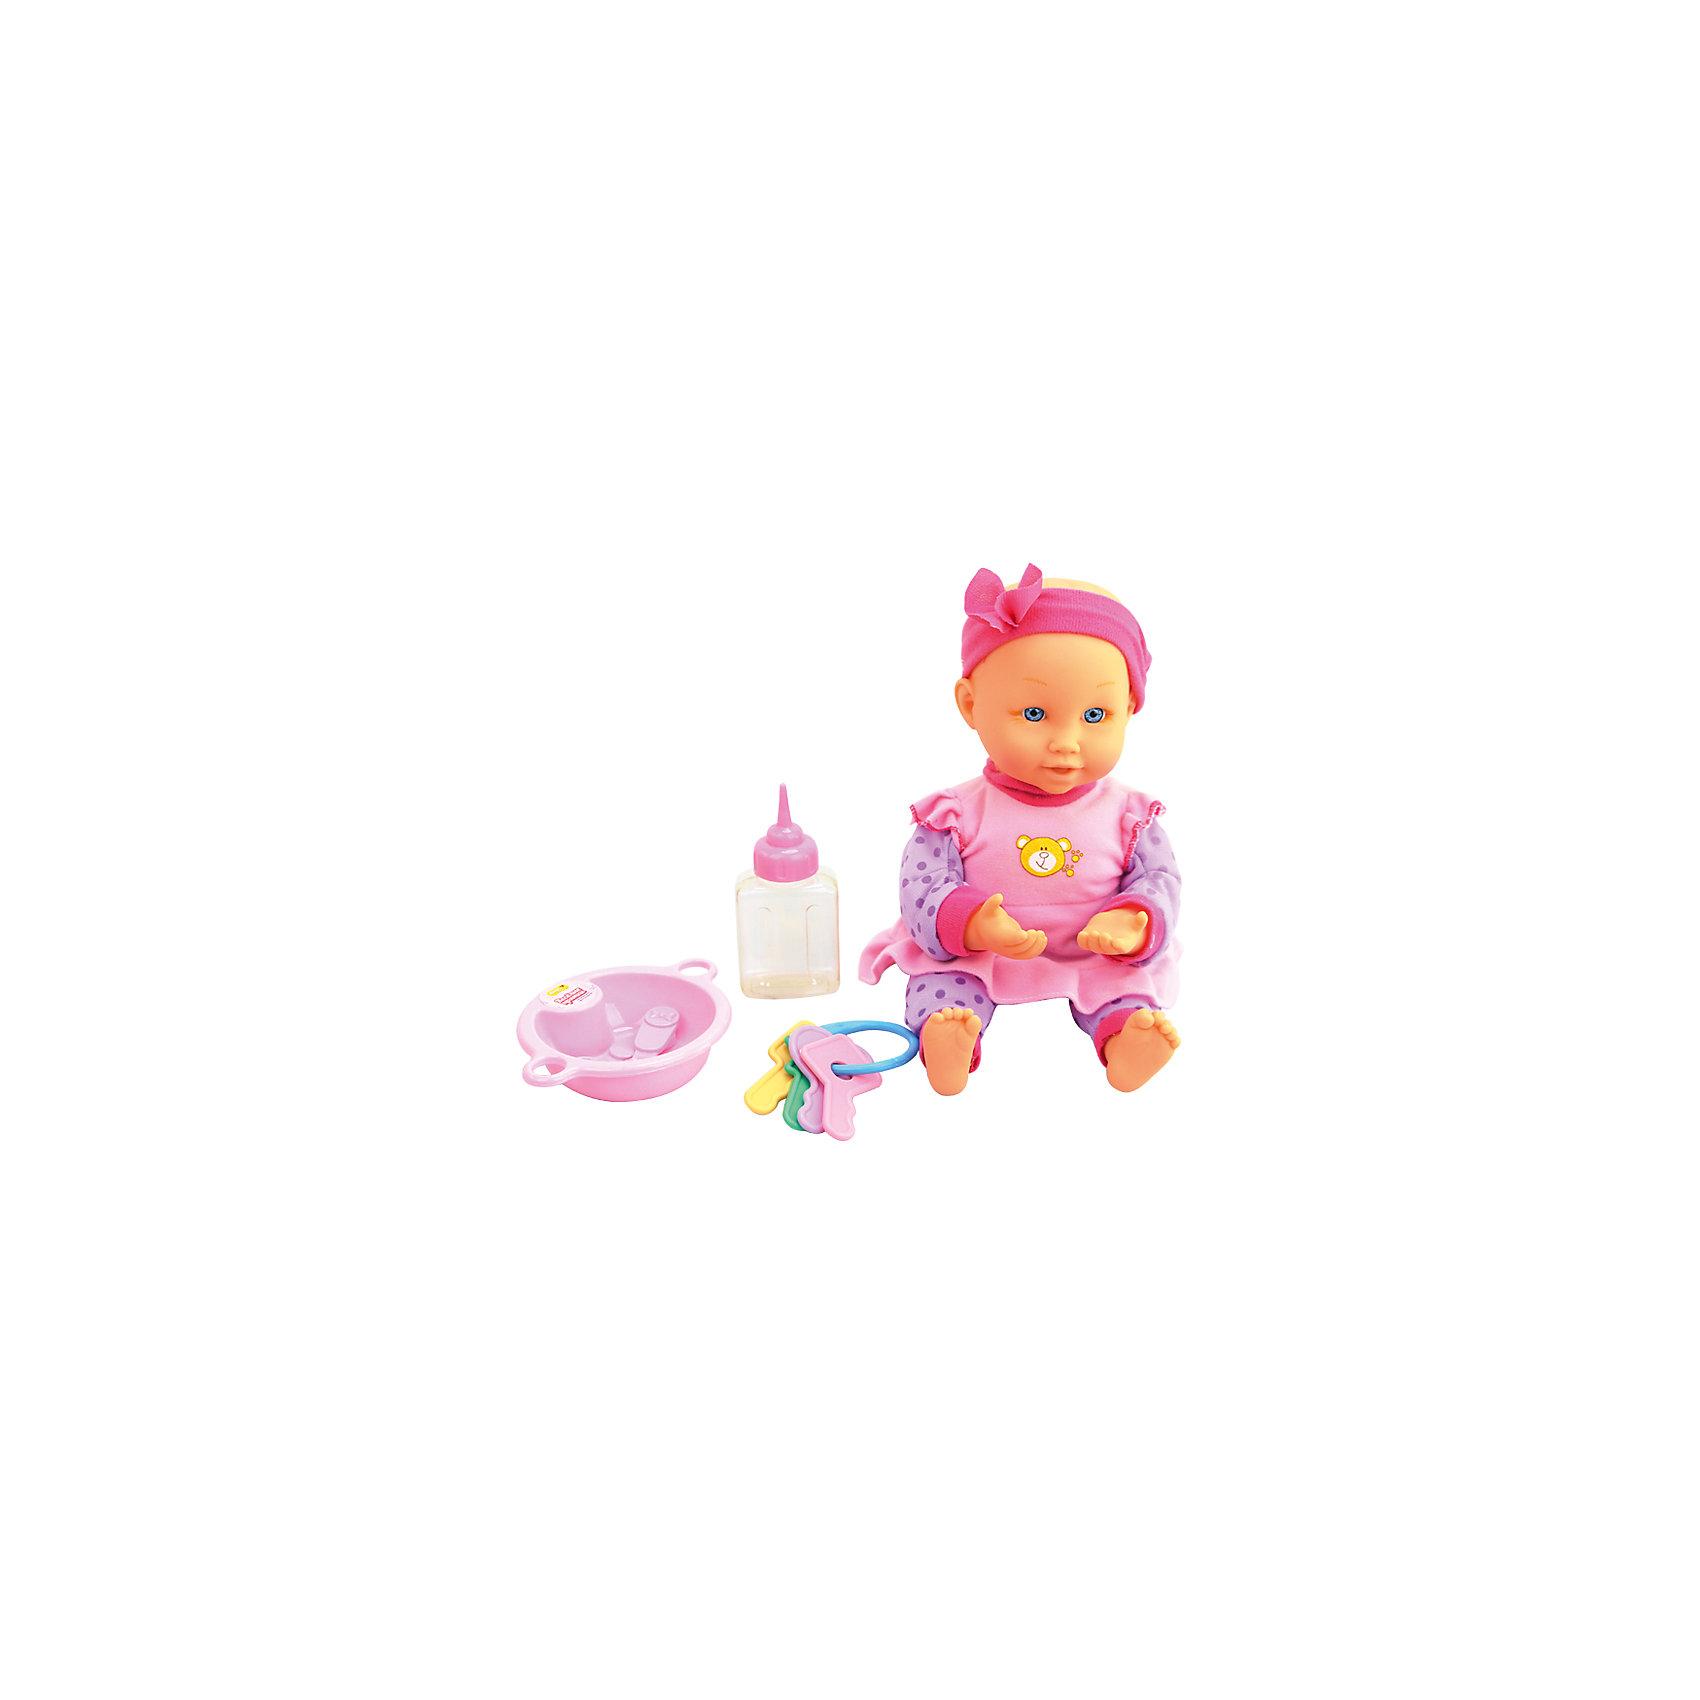 Интерактивная кукла-младенец  Весёлые прятки, 32 см, DollyToyКуклы-пупсы<br><br><br>Ширина мм: 300<br>Глубина мм: 155<br>Высота мм: 335<br>Вес г: 992<br>Возраст от месяцев: 36<br>Возраст до месяцев: 72<br>Пол: Женский<br>Возраст: Детский<br>SKU: 5581280